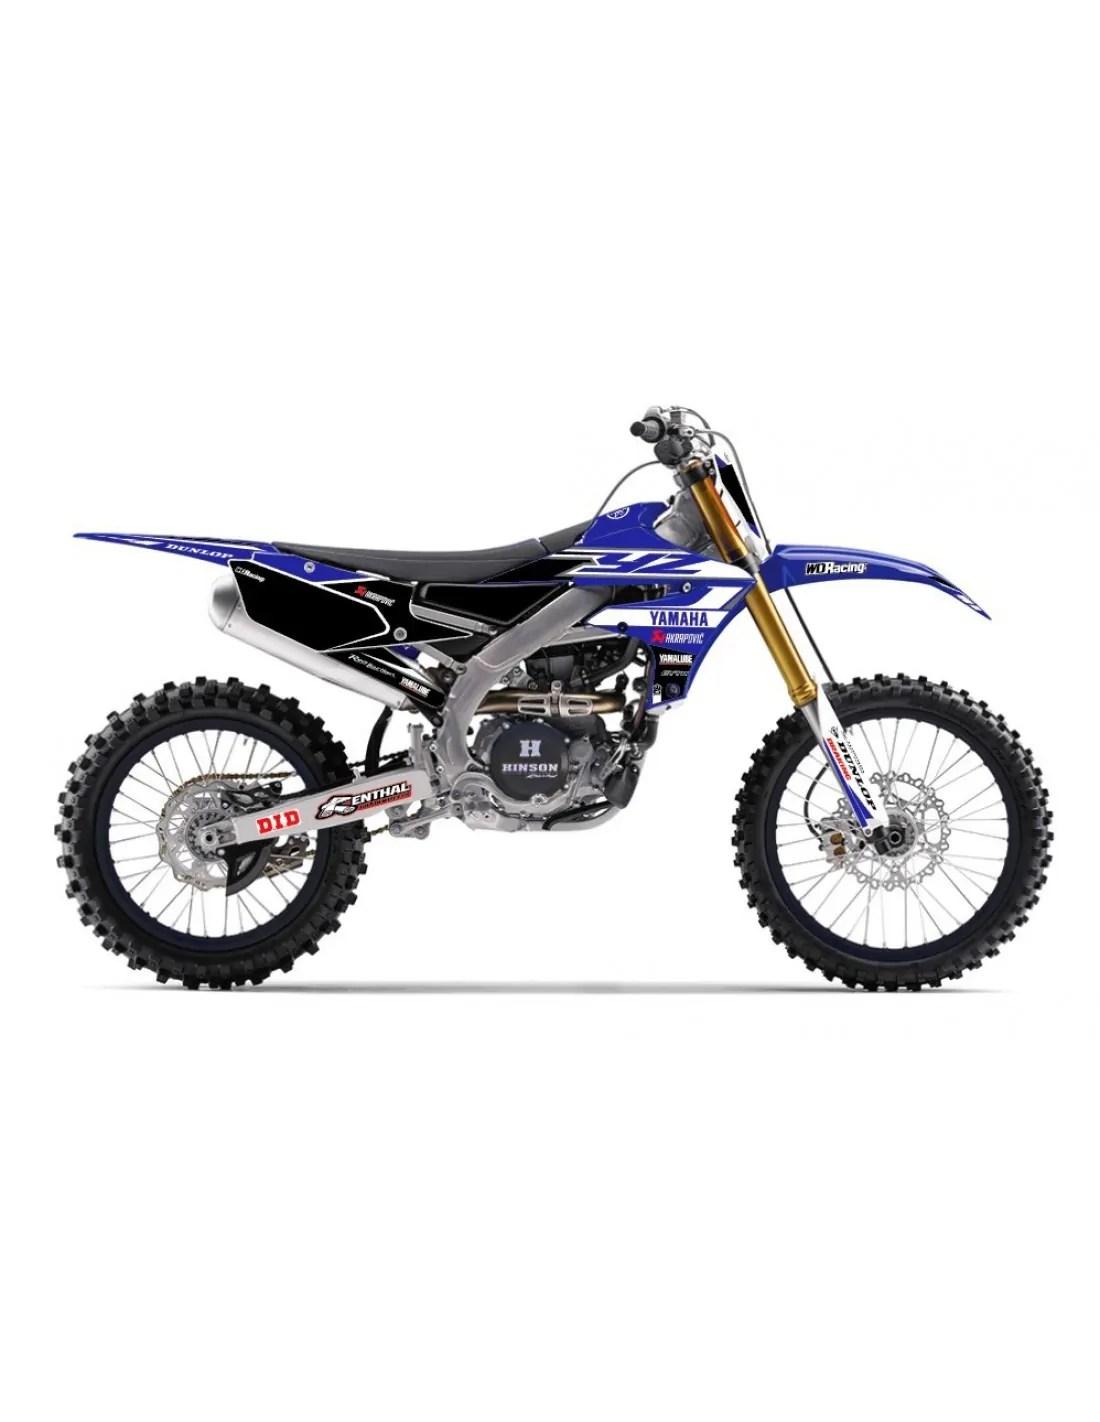 Grafiche Yamaha Yz Yzf Wrf 85 125 250 450 Champ